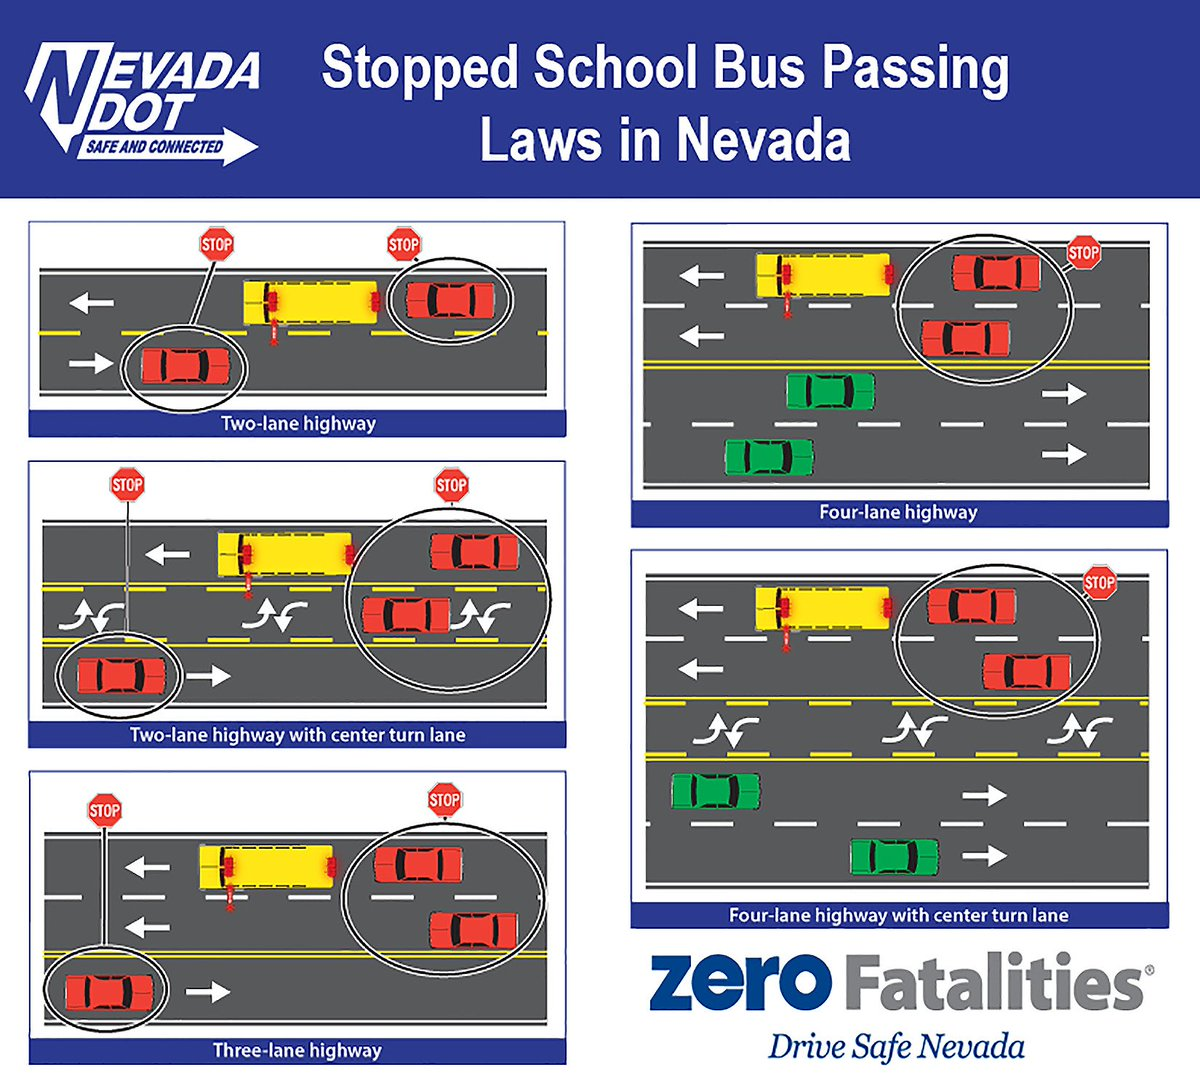 Reminder: School starts on August 29. Be safe @DriveSafeNV @NVTeenDriver @NevadaDPS @ClarkCountySch @WCSDTweet https://t.co/z9ZM6x6HRq